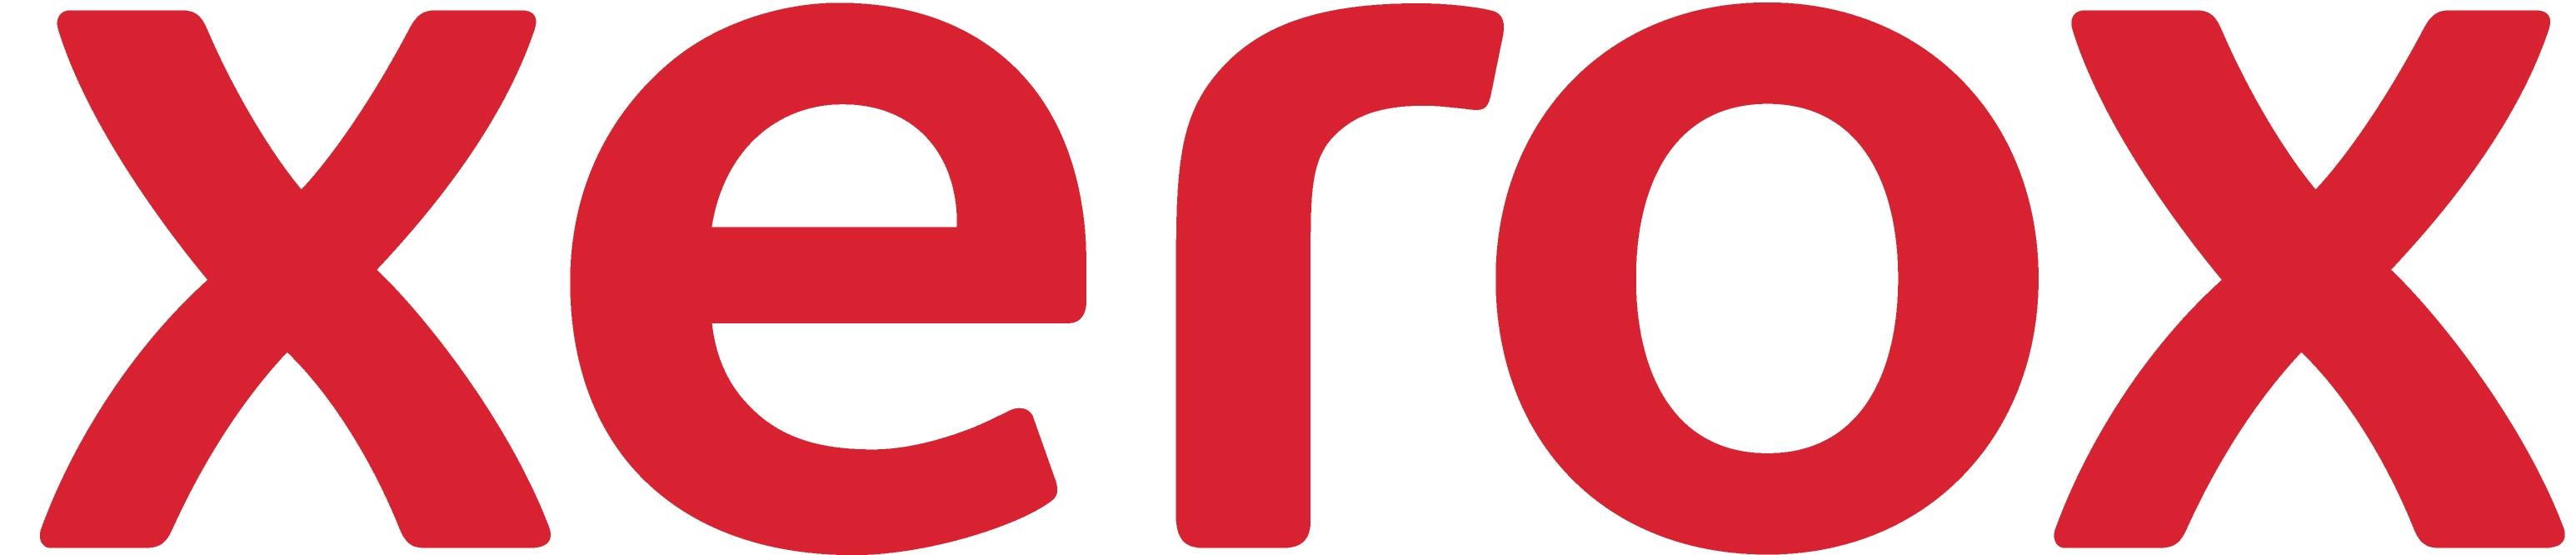 Xerox Logo - fedinvestonline